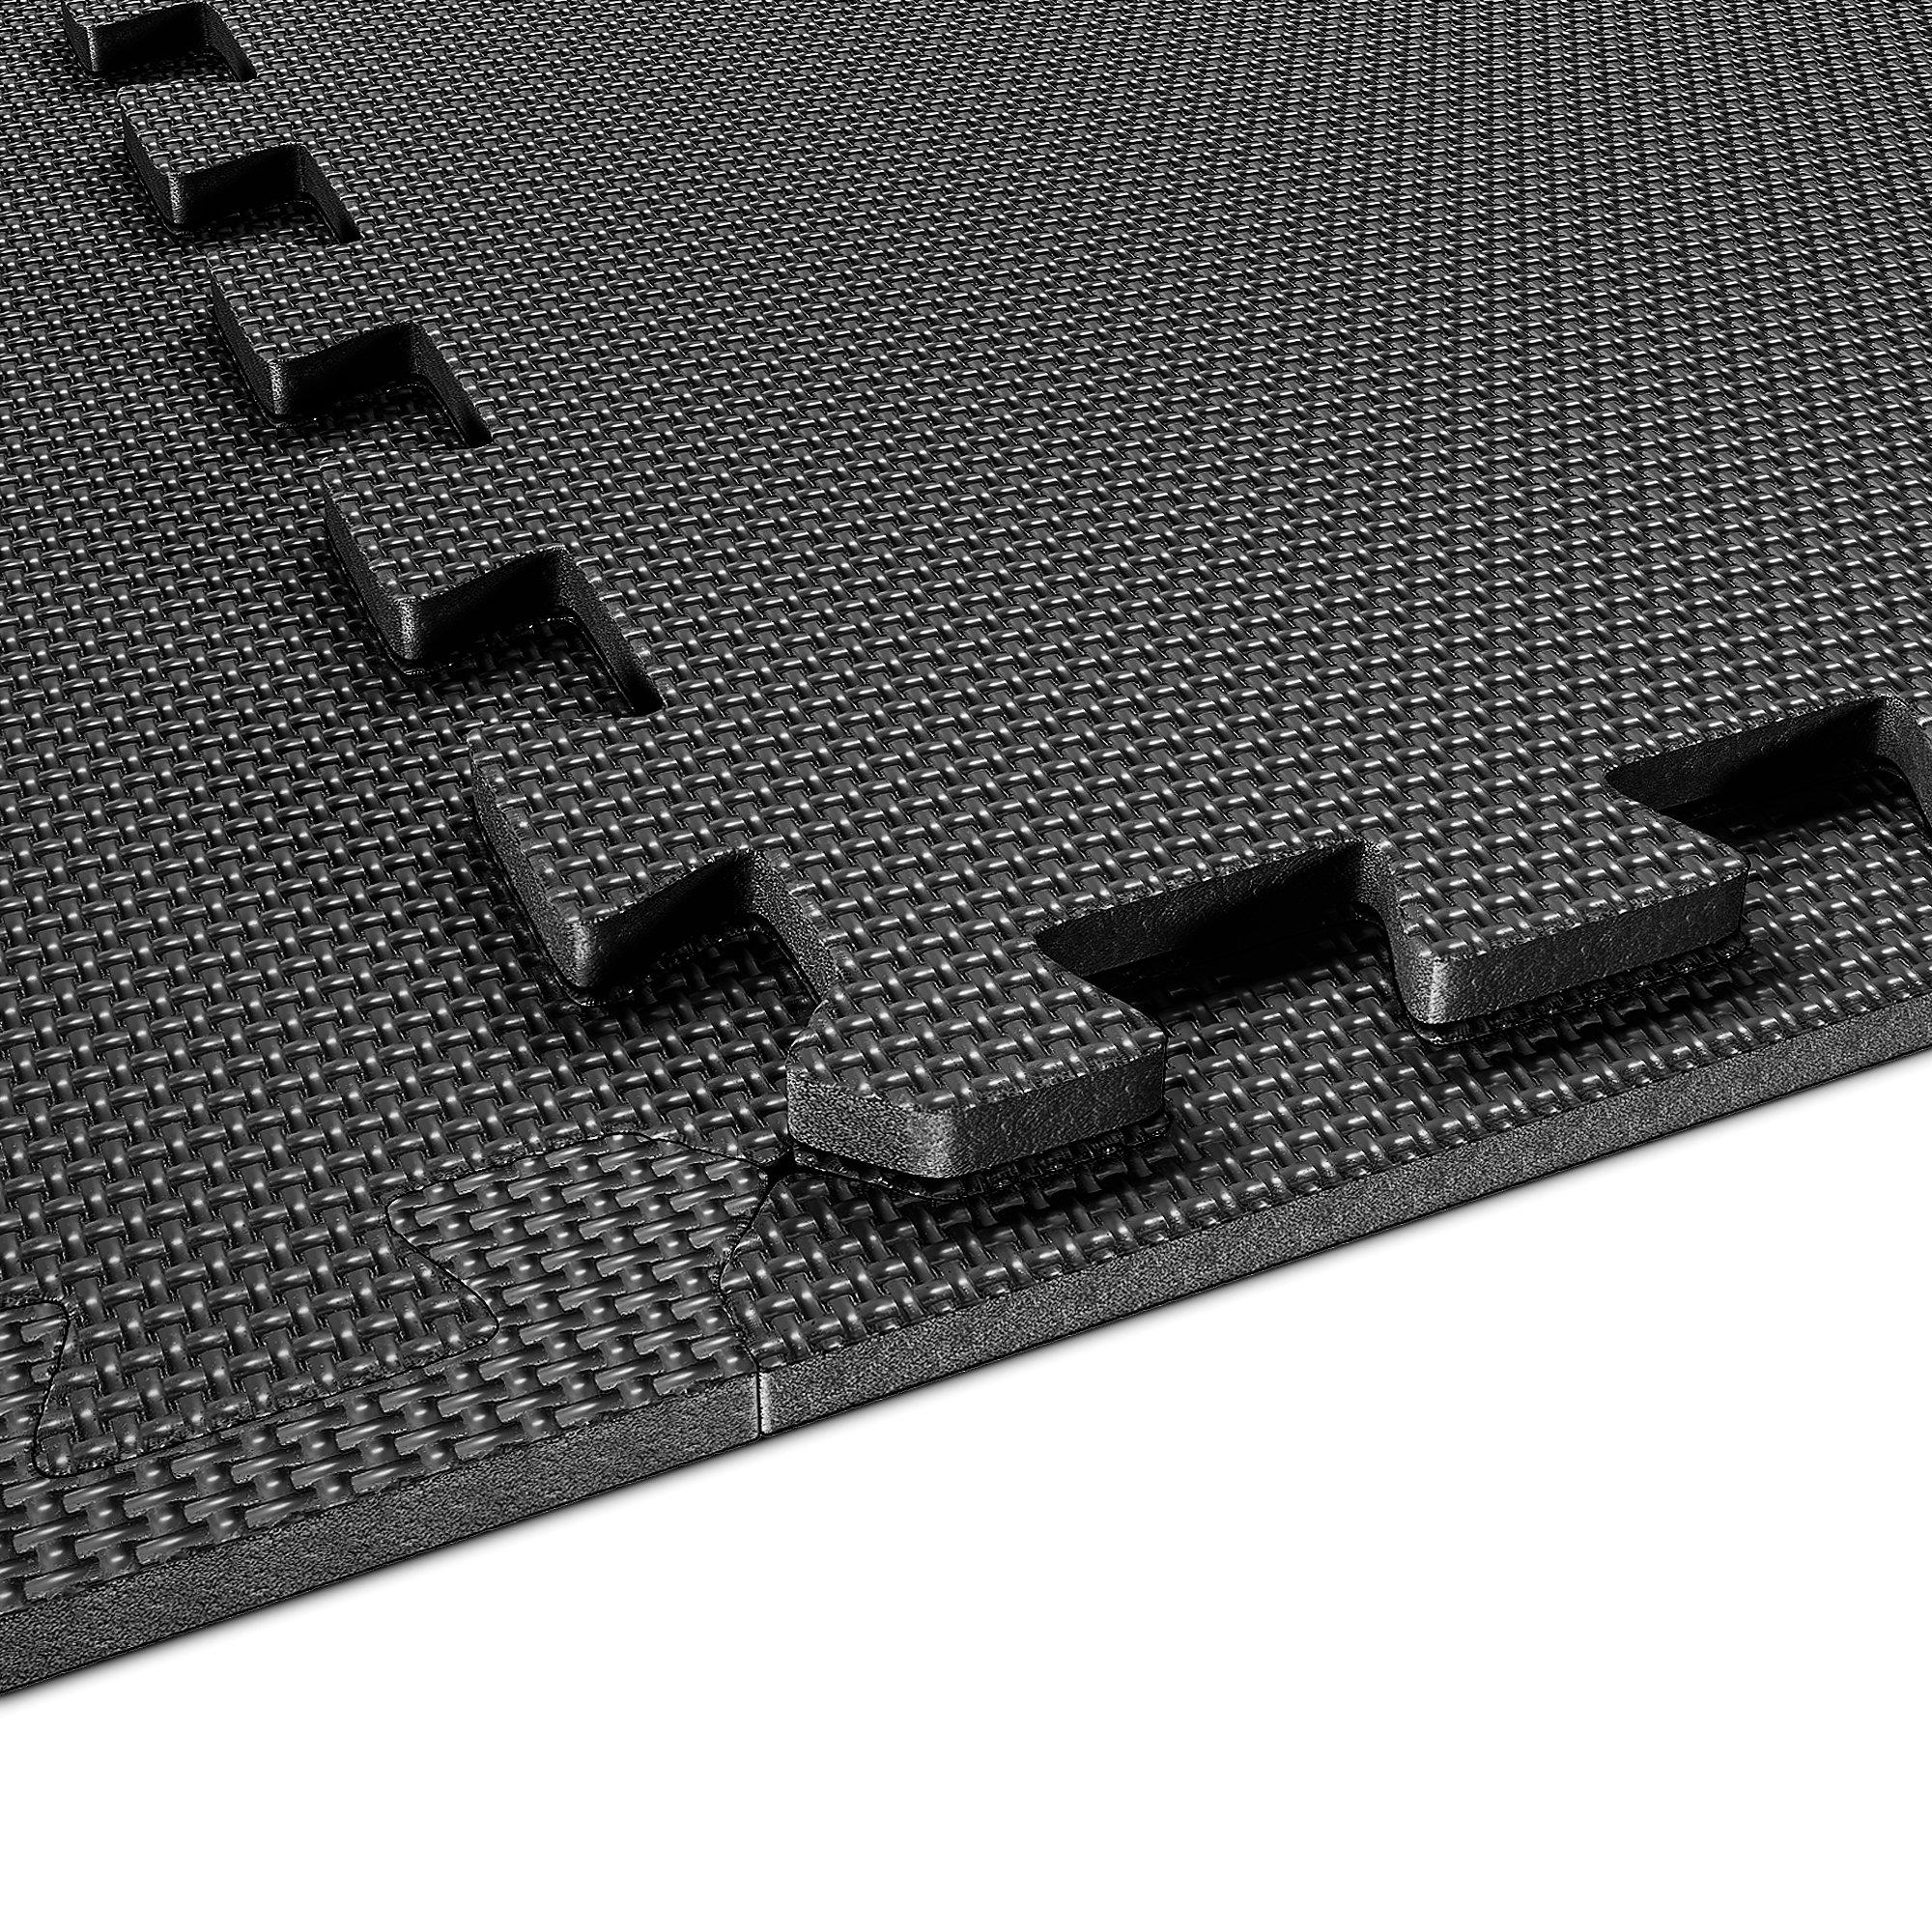 Interlocking Soft Foam Floor Mats 18 Pieces Eva Puzzle Rubber Tiles Protective Flooring Set